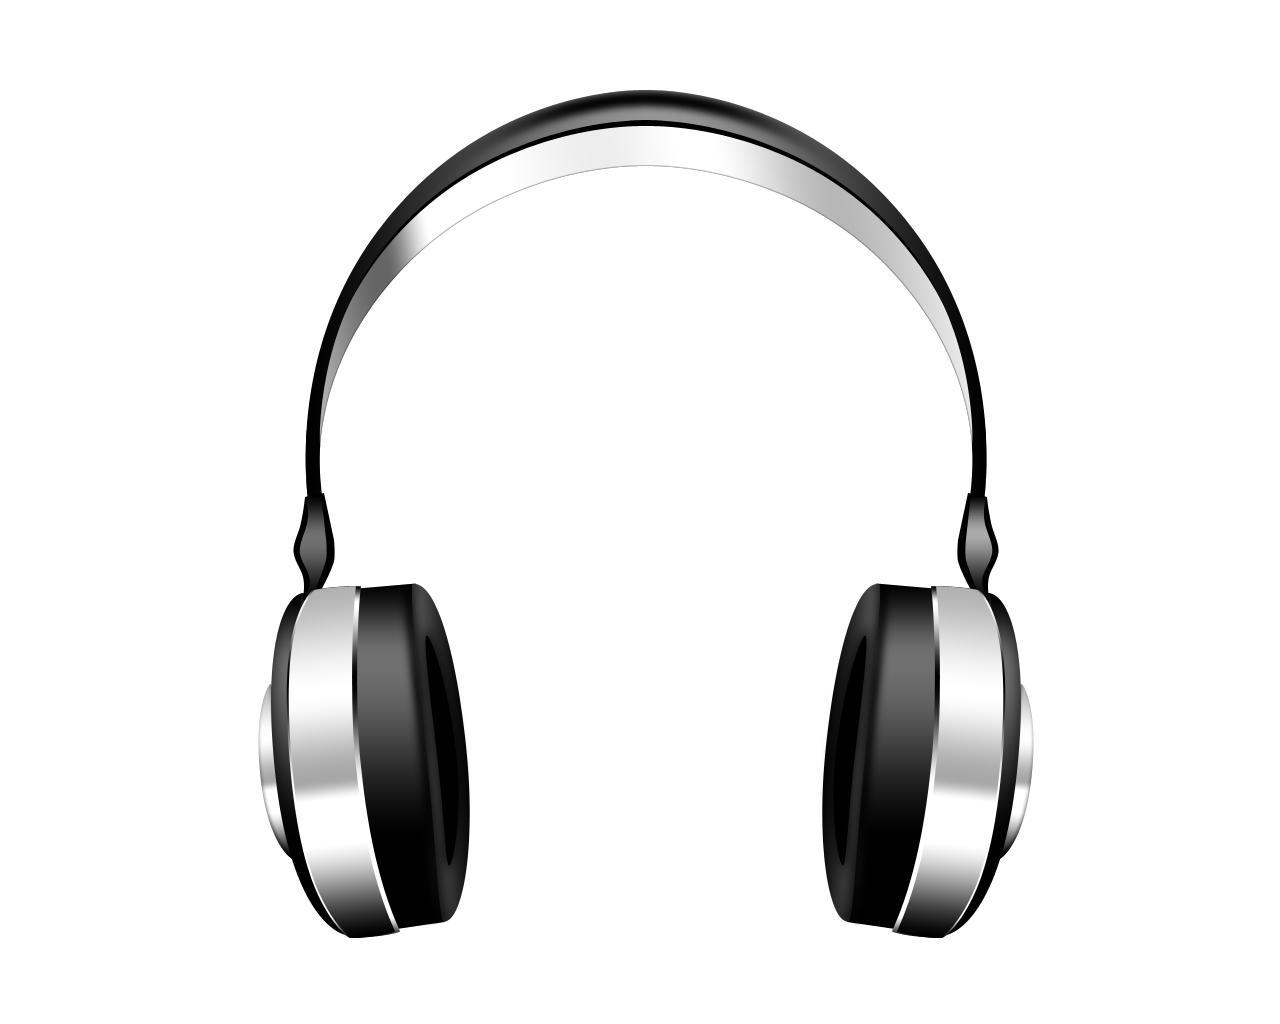 Pin by Charudeal on Mac & Dj Music headphones